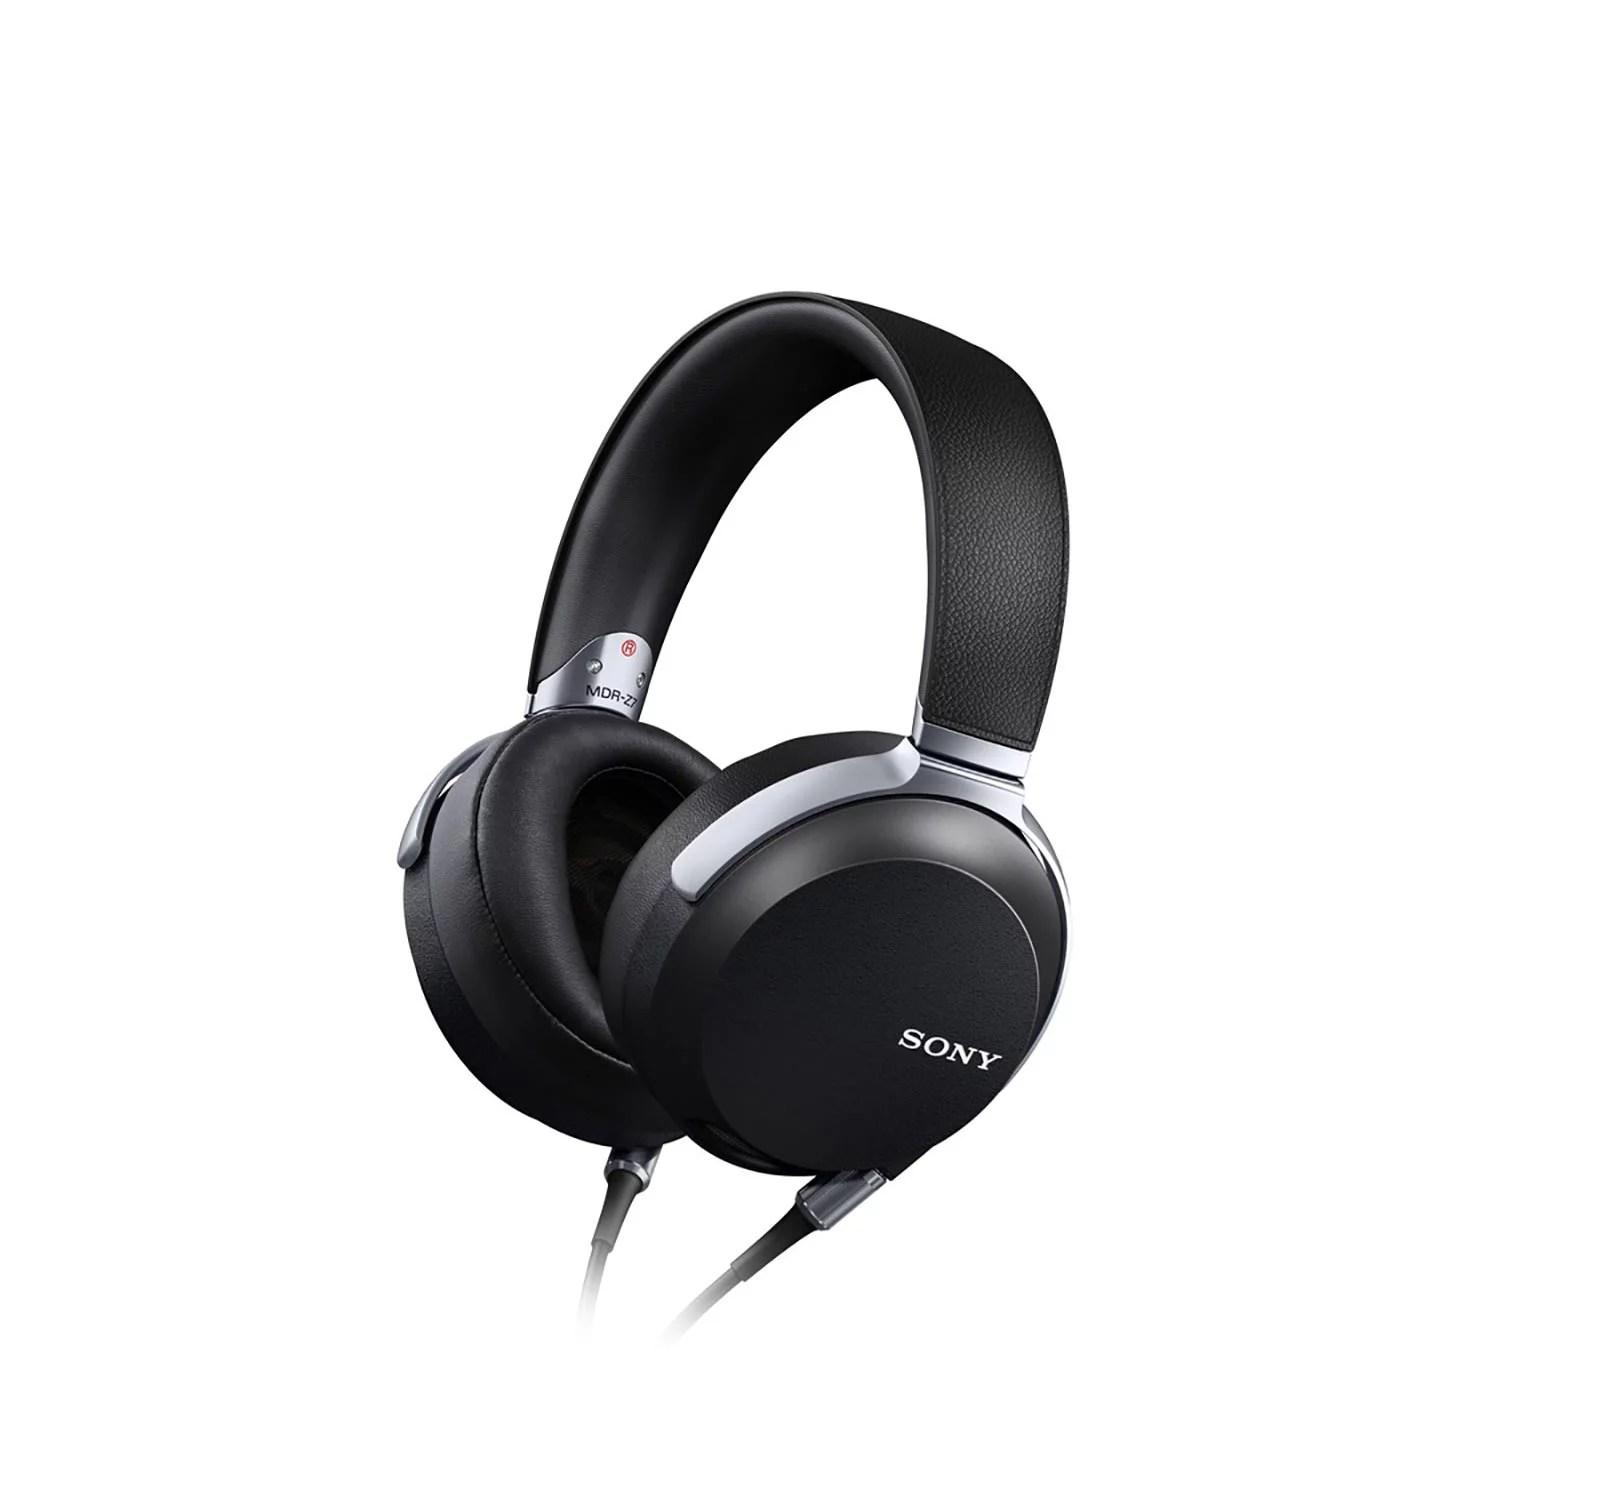 20 Best Sony MDR-Z7 Headphones Black Friday Deals 2019